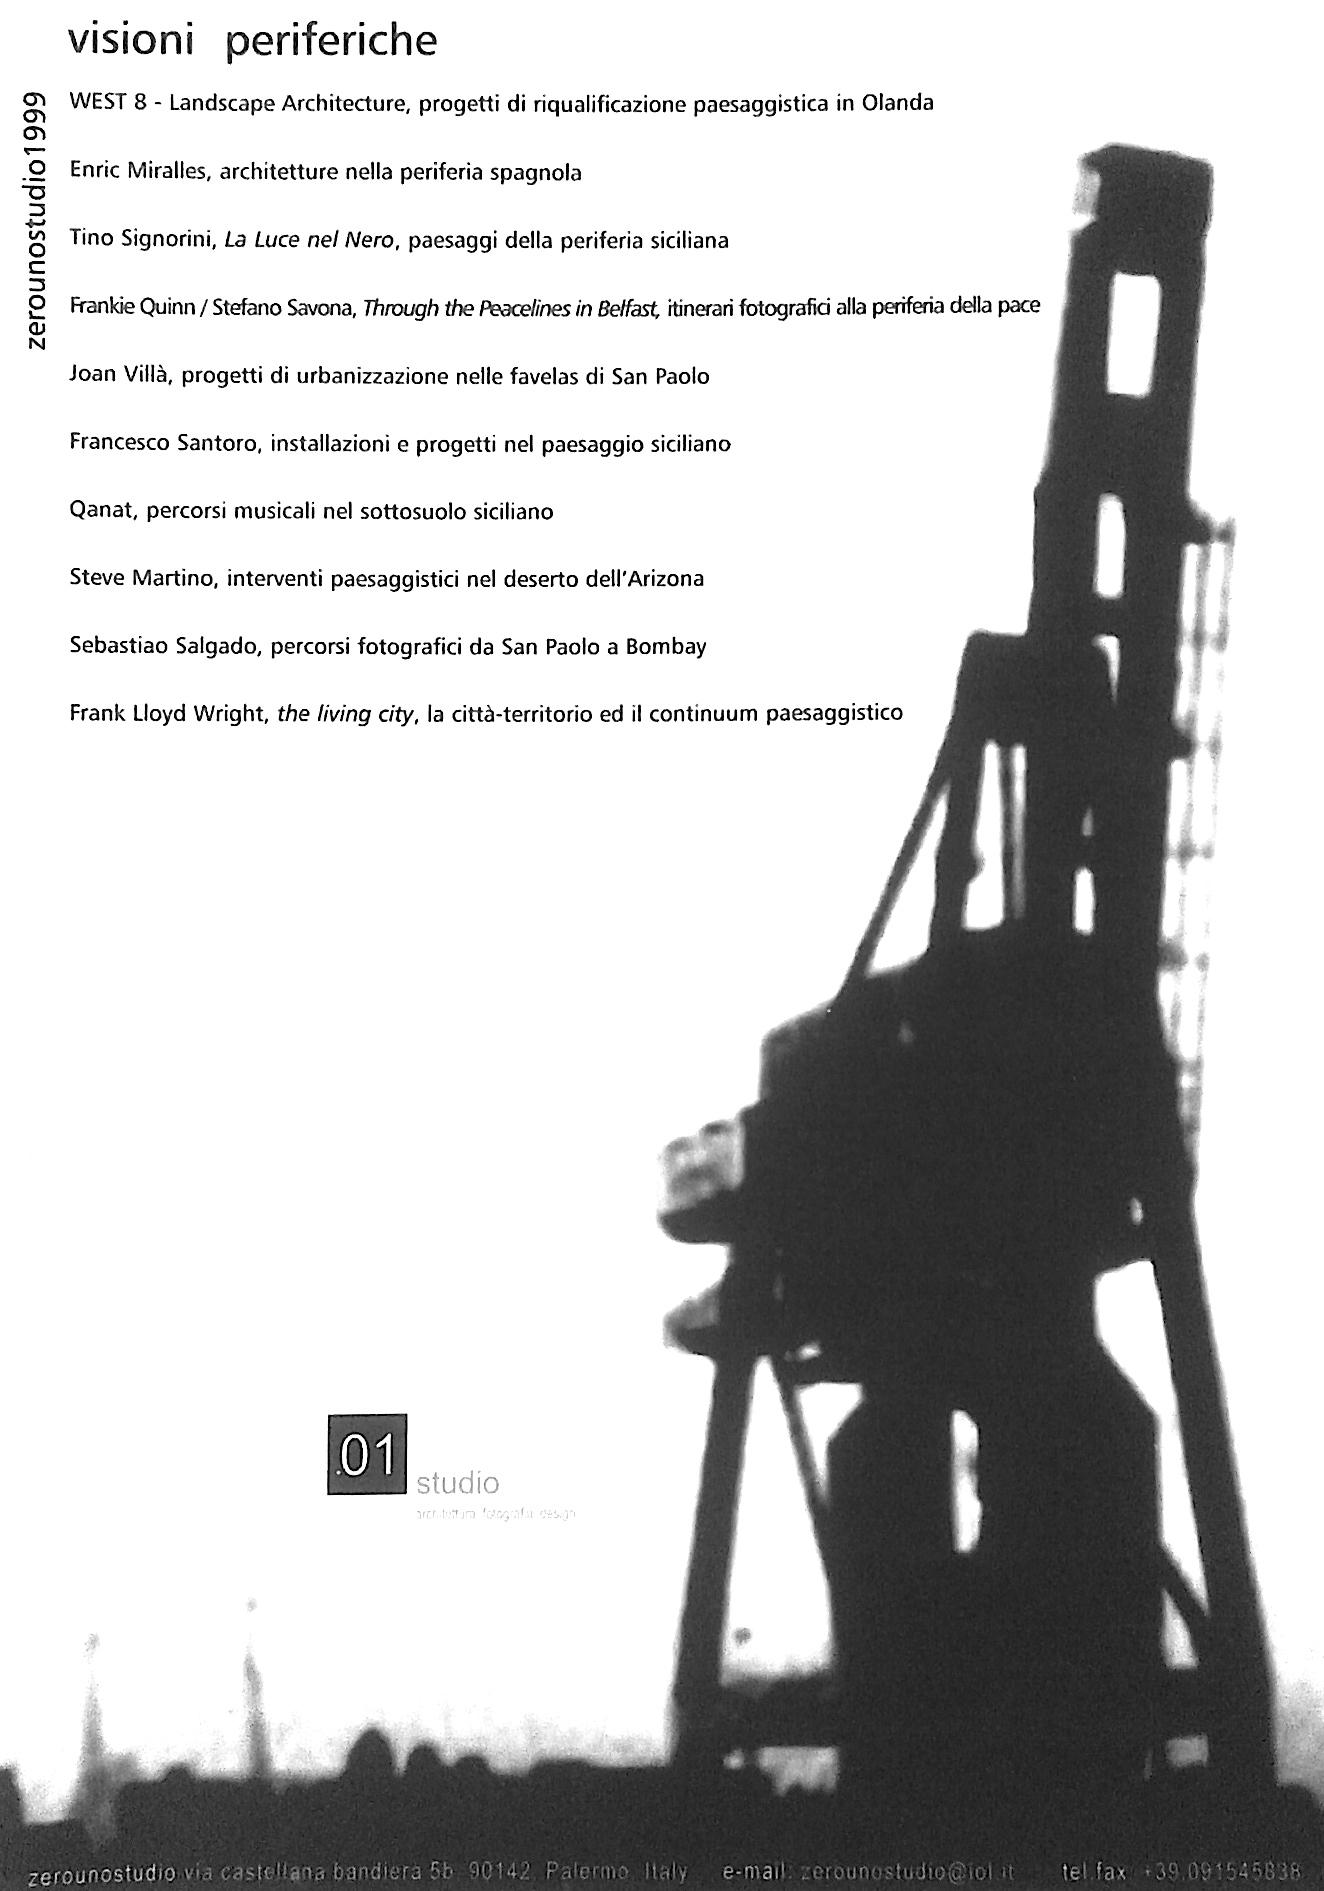 1999 lecture program